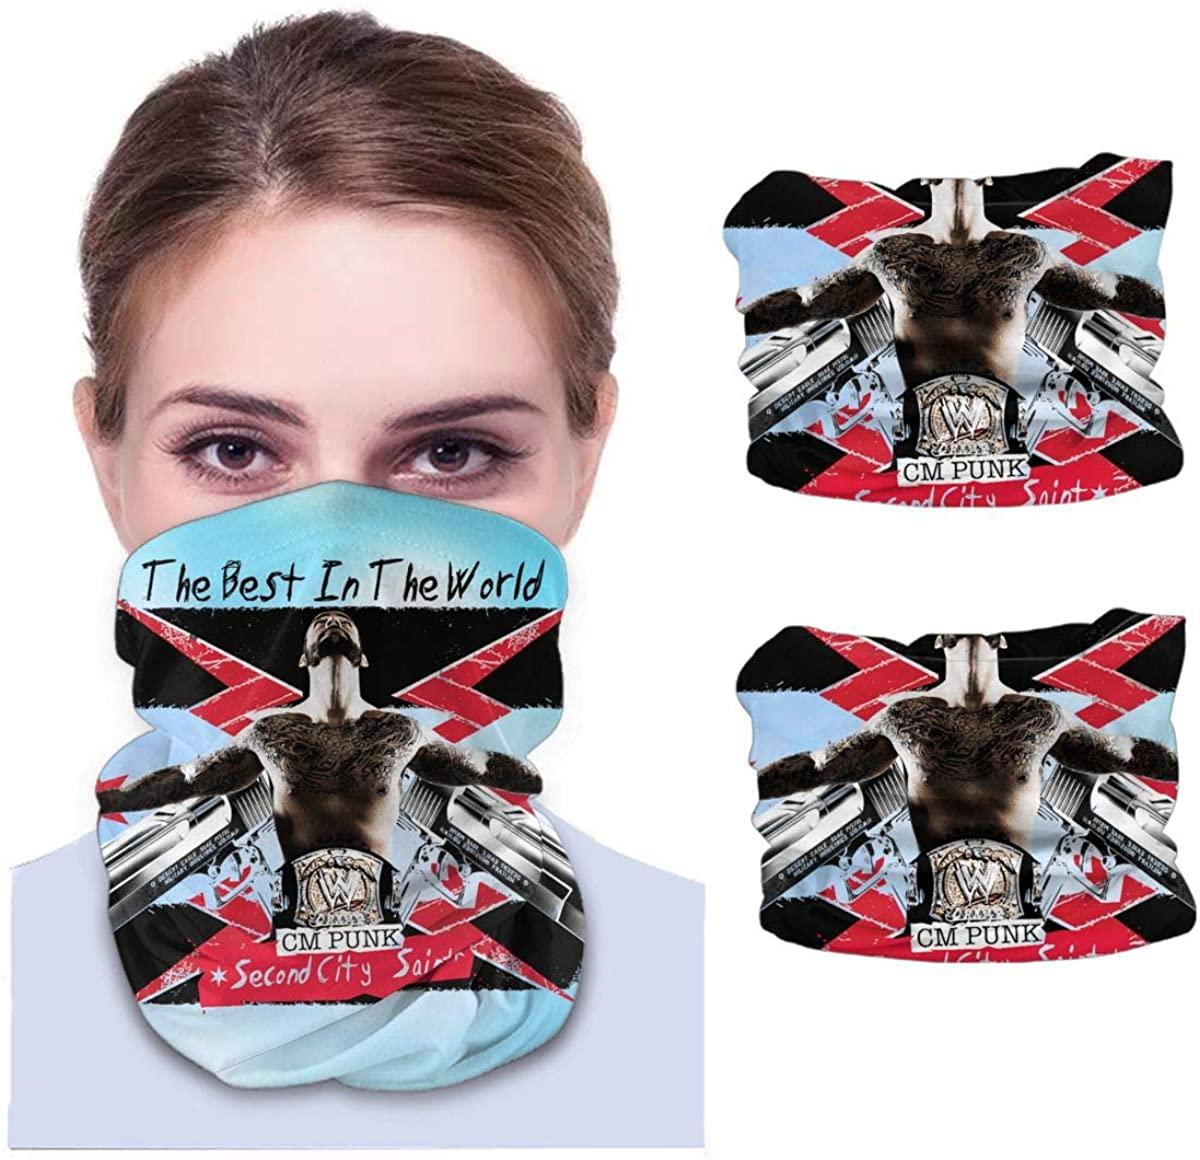 Cm Punk Neck Gaiter Face Scarf-Dust, Sun Protection Cool Lightweight Windproof